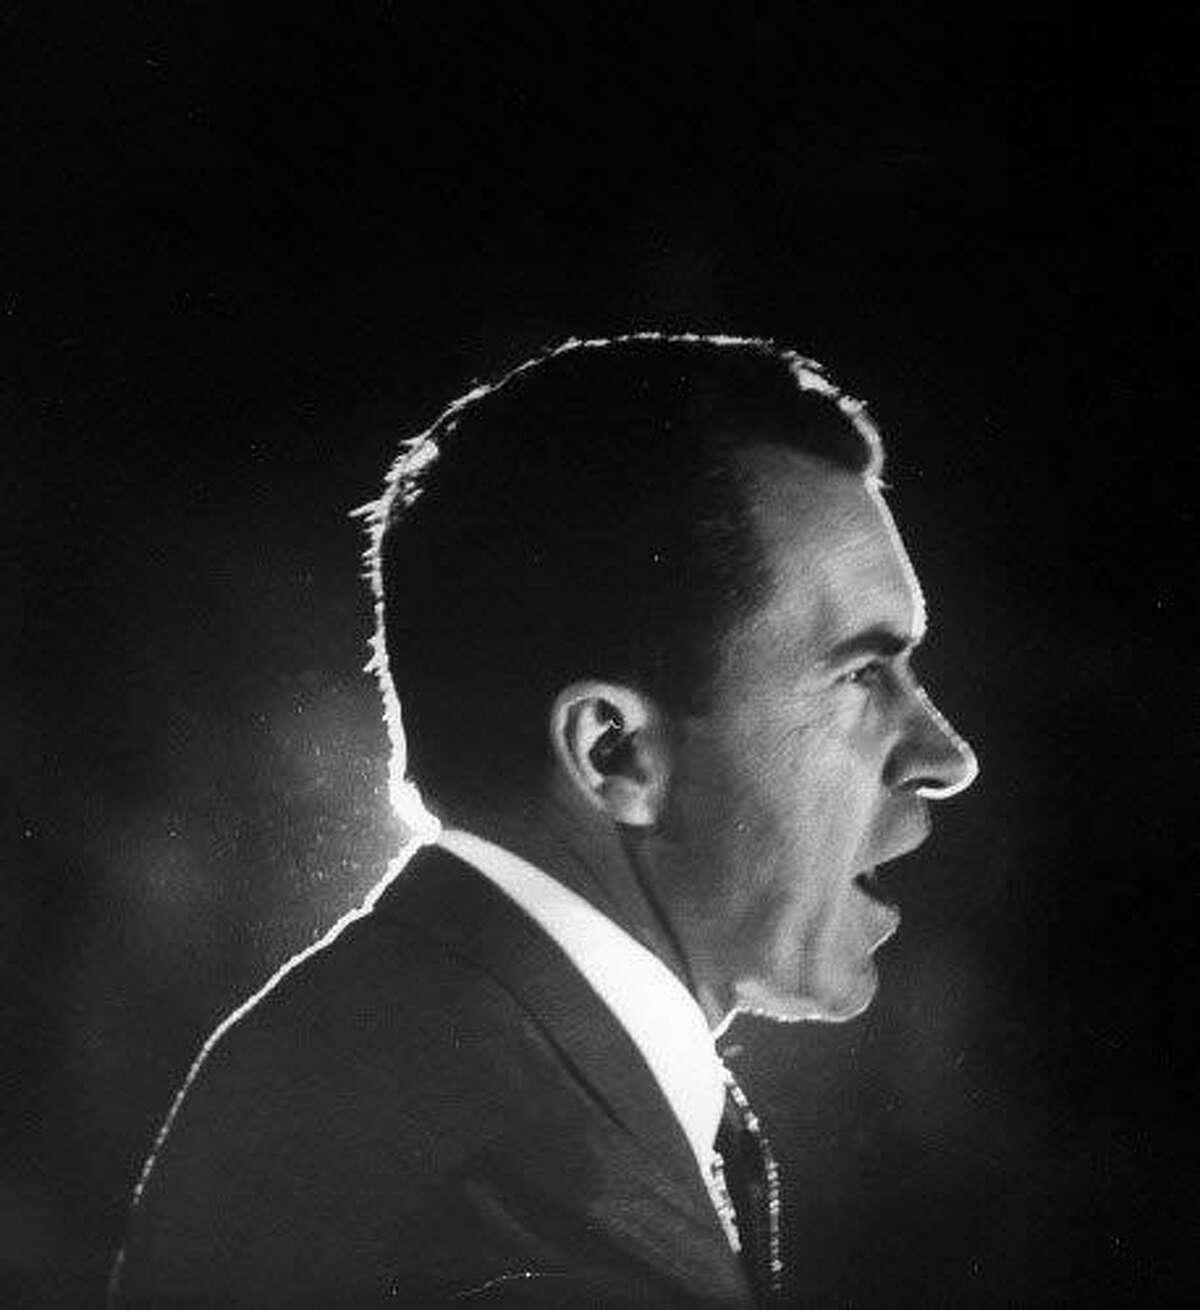 Vice President Richard M. Nixon campaigning in 1960.